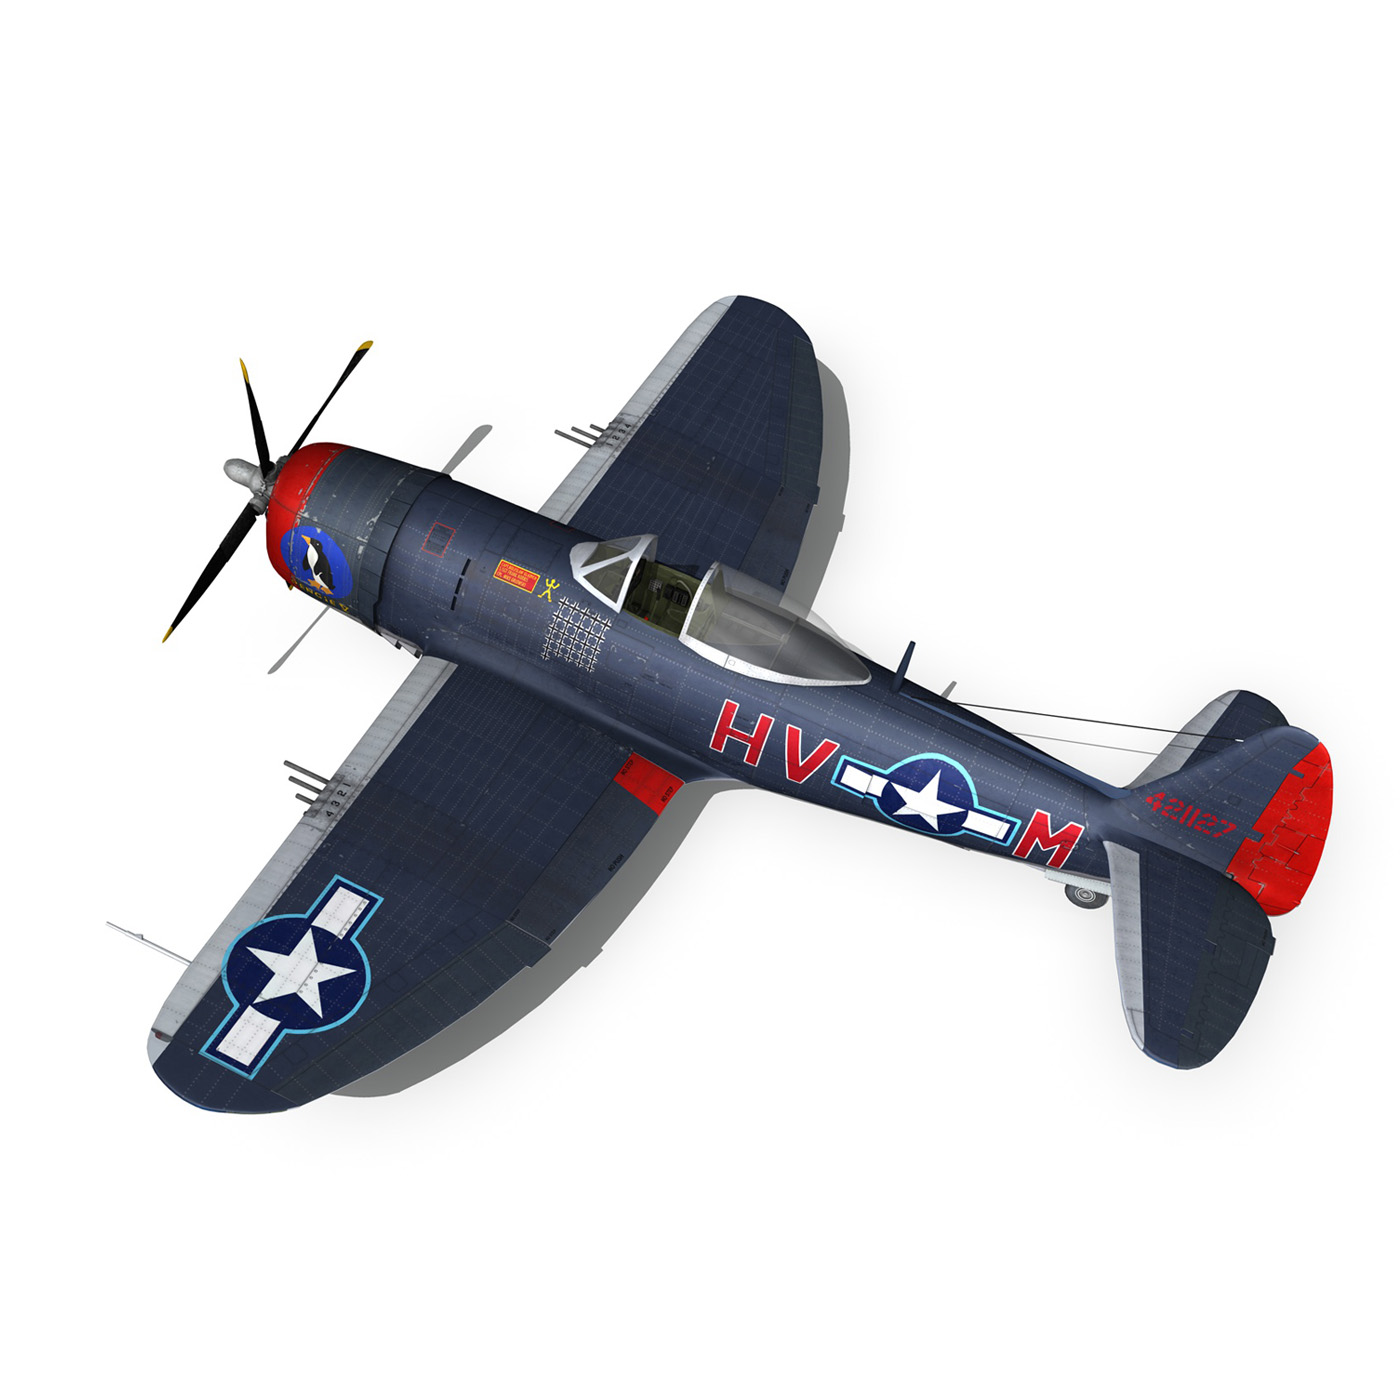 republic p-47m thunderbolt – pengie v 3d model 3ds c4d fbx lwo lw lws obj 279726